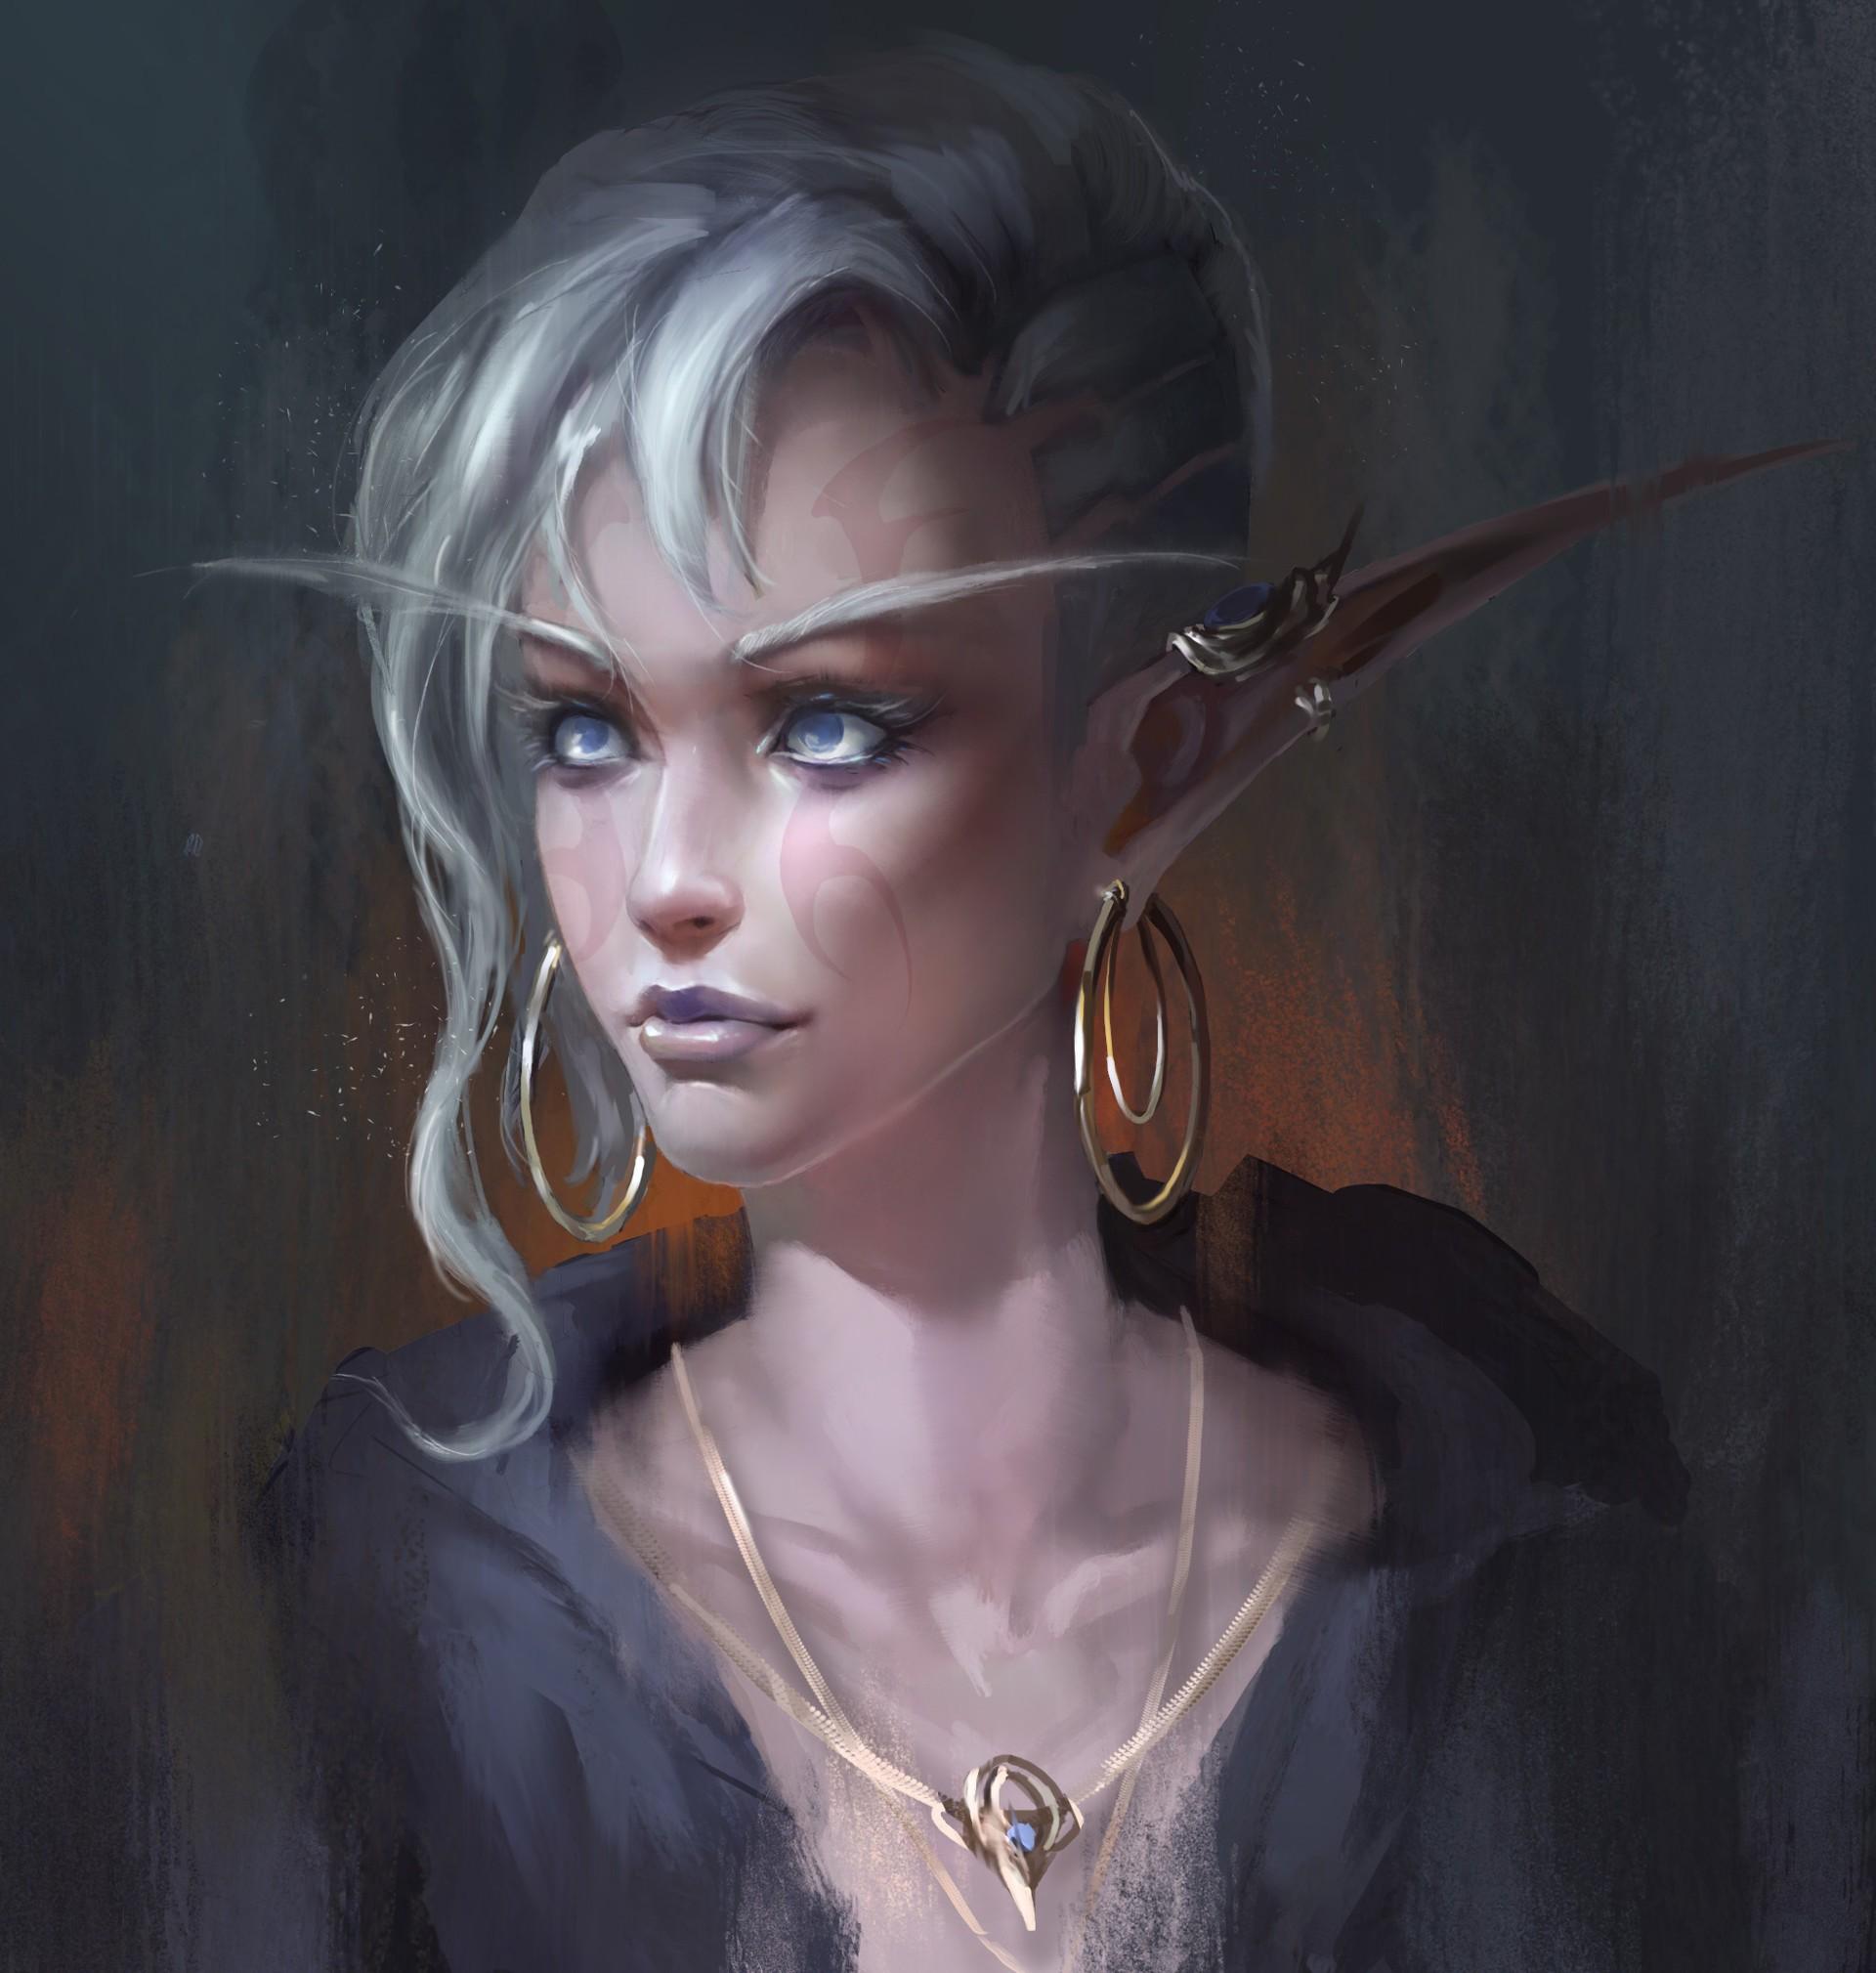 General 1920x2019 fantasy art fantasy girl necklace artwork blue eyes elf ears